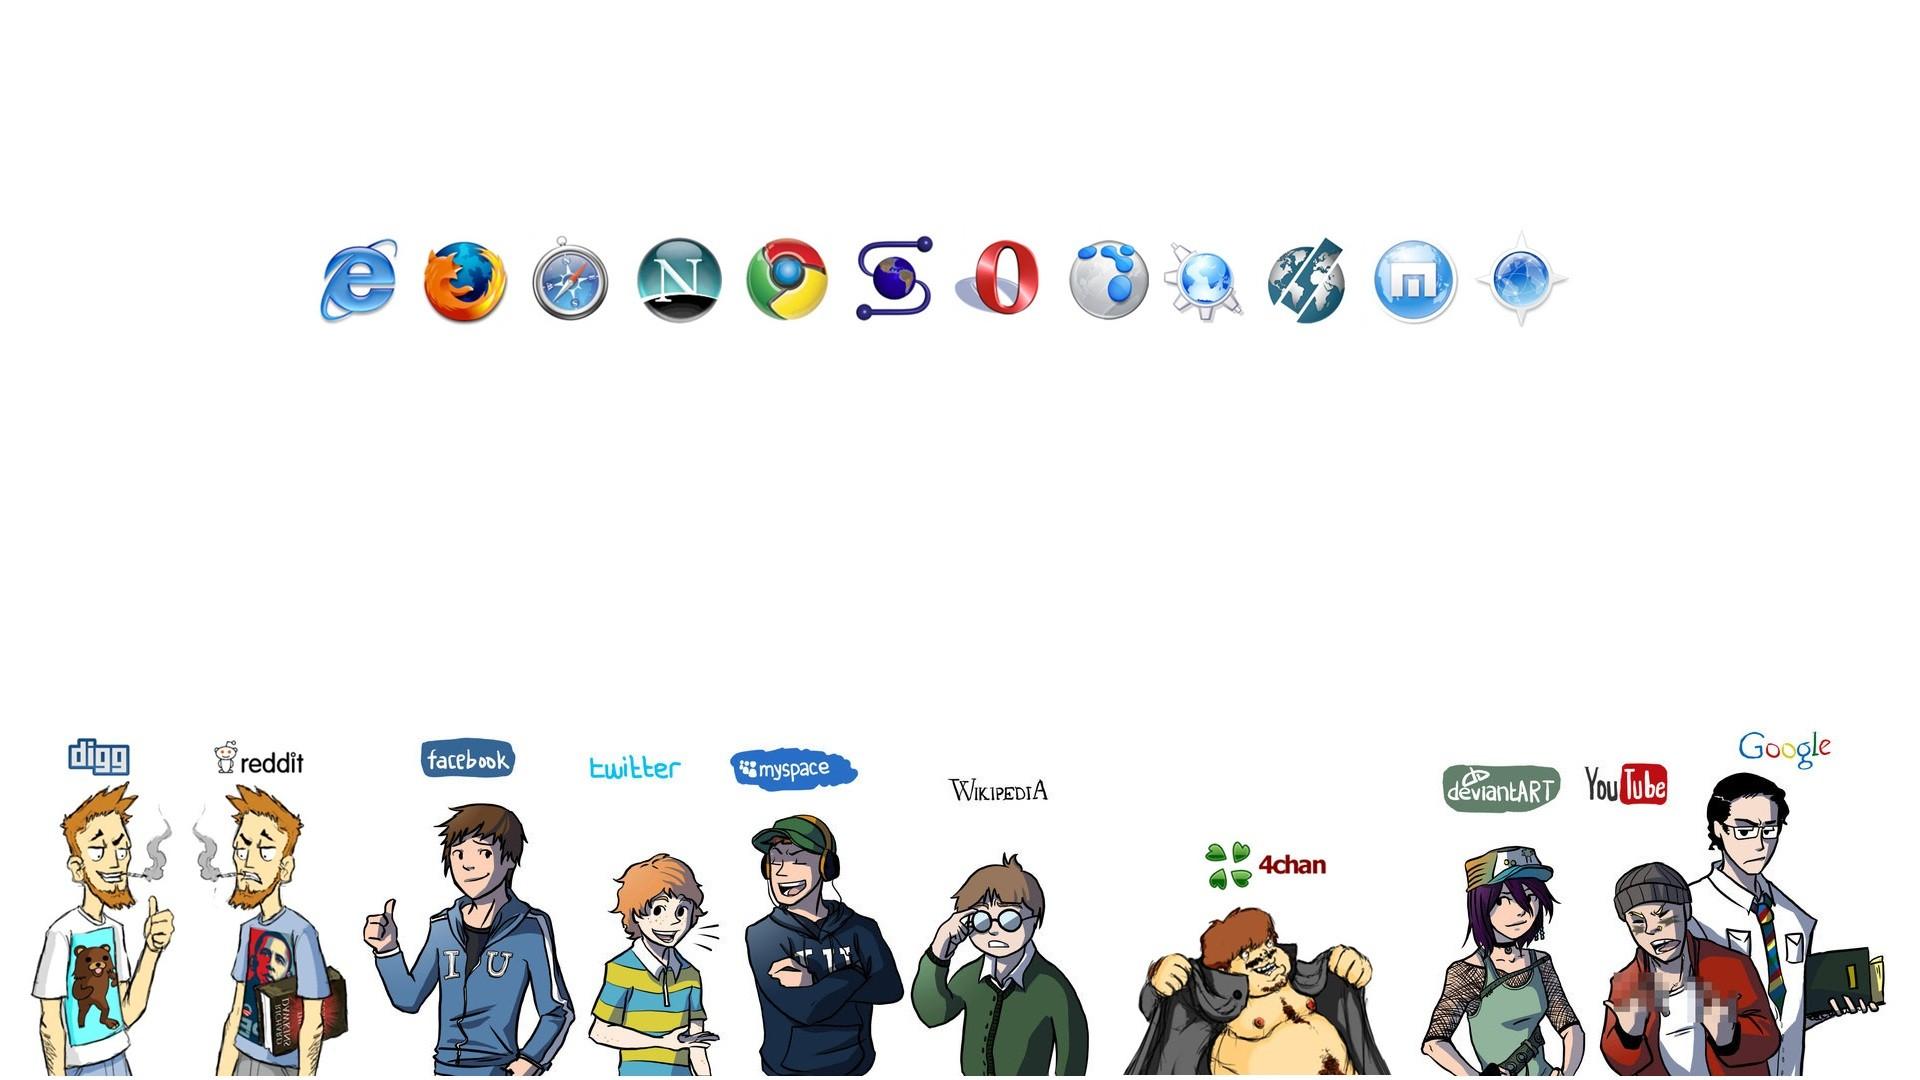 General 1920x1080 reddit Facebook Twitter MySpace 4chan DeviantArt YouTube Google Internet Explorer Mozilla Firefox Google Chrome Opera browser